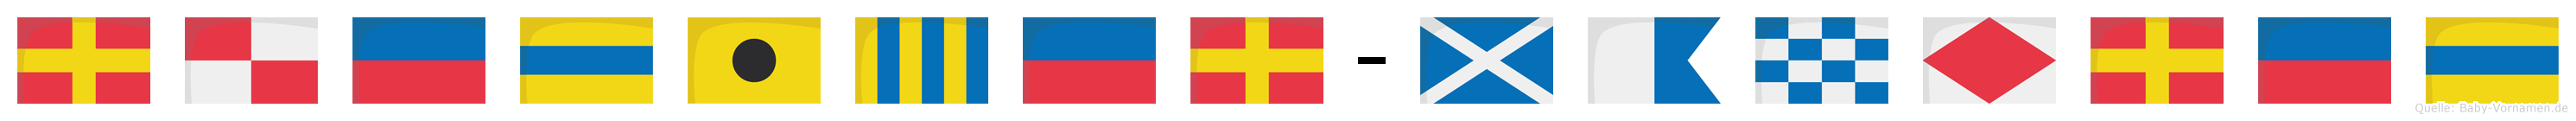 Rüdiger-Manfred im Flaggenalphabet